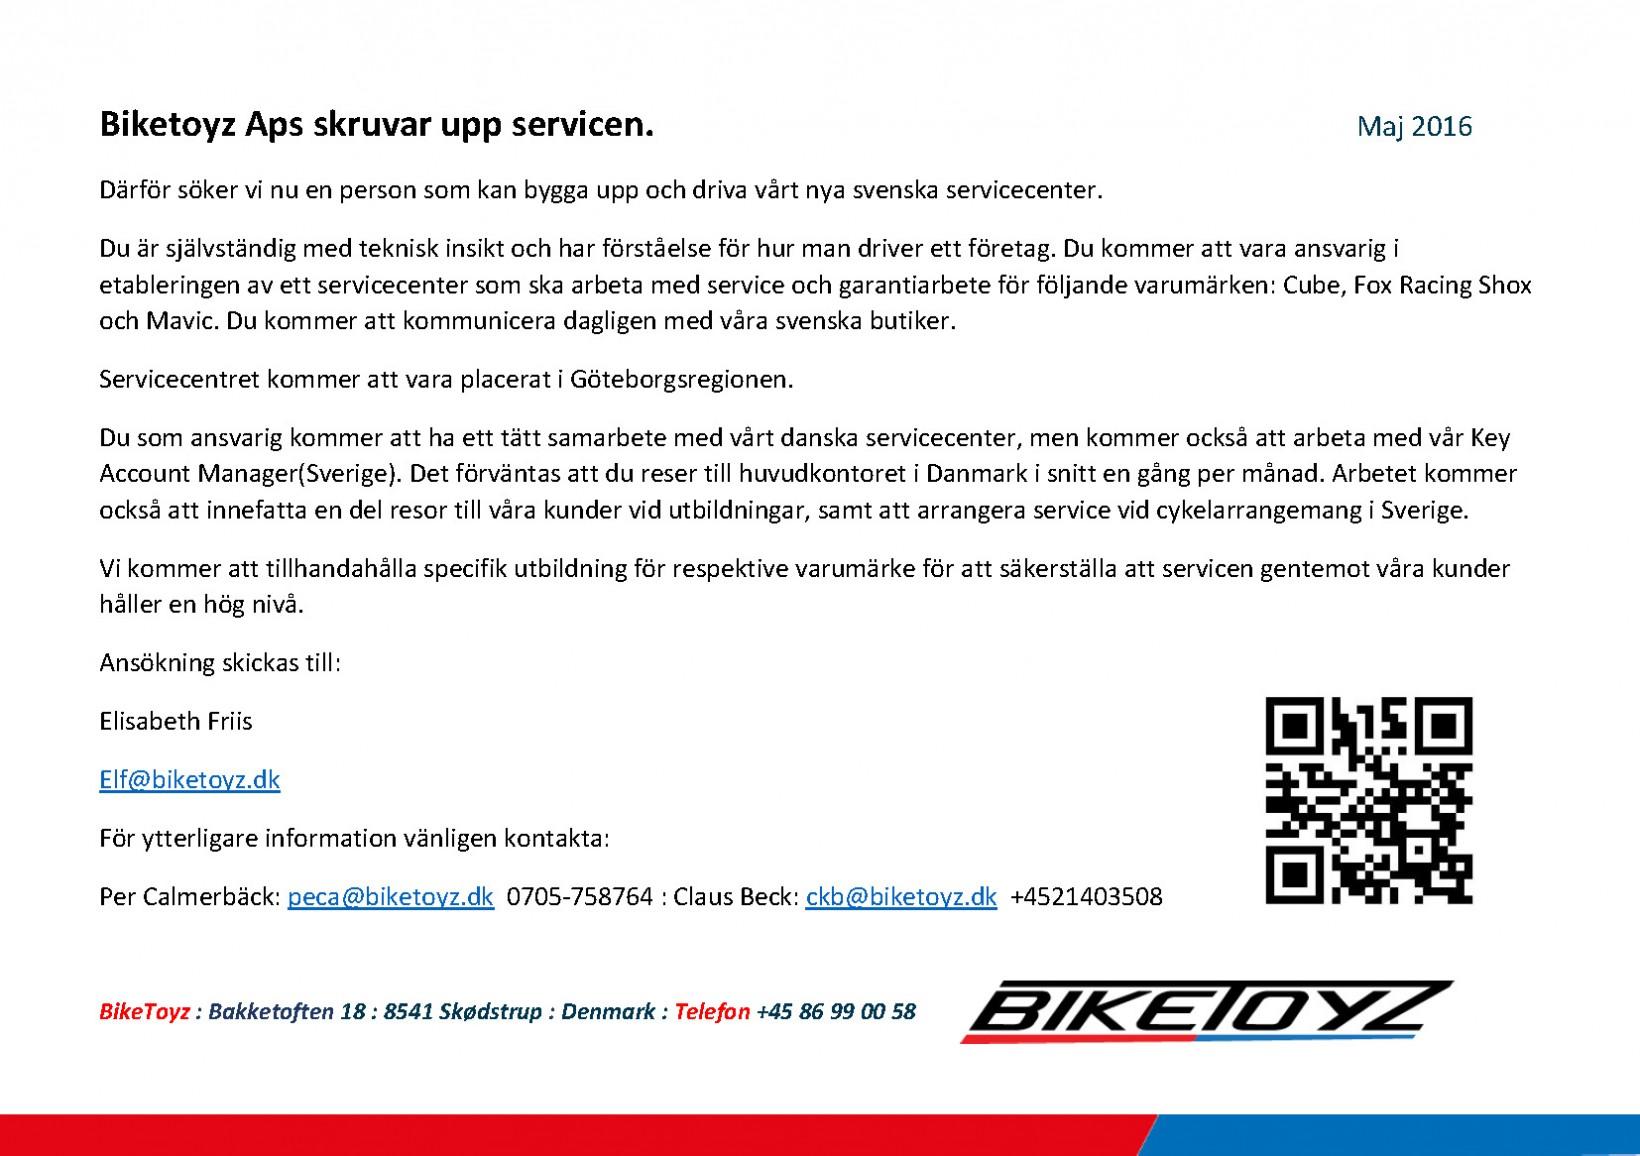 Biketoyz Aps skruvar upp servicen A5